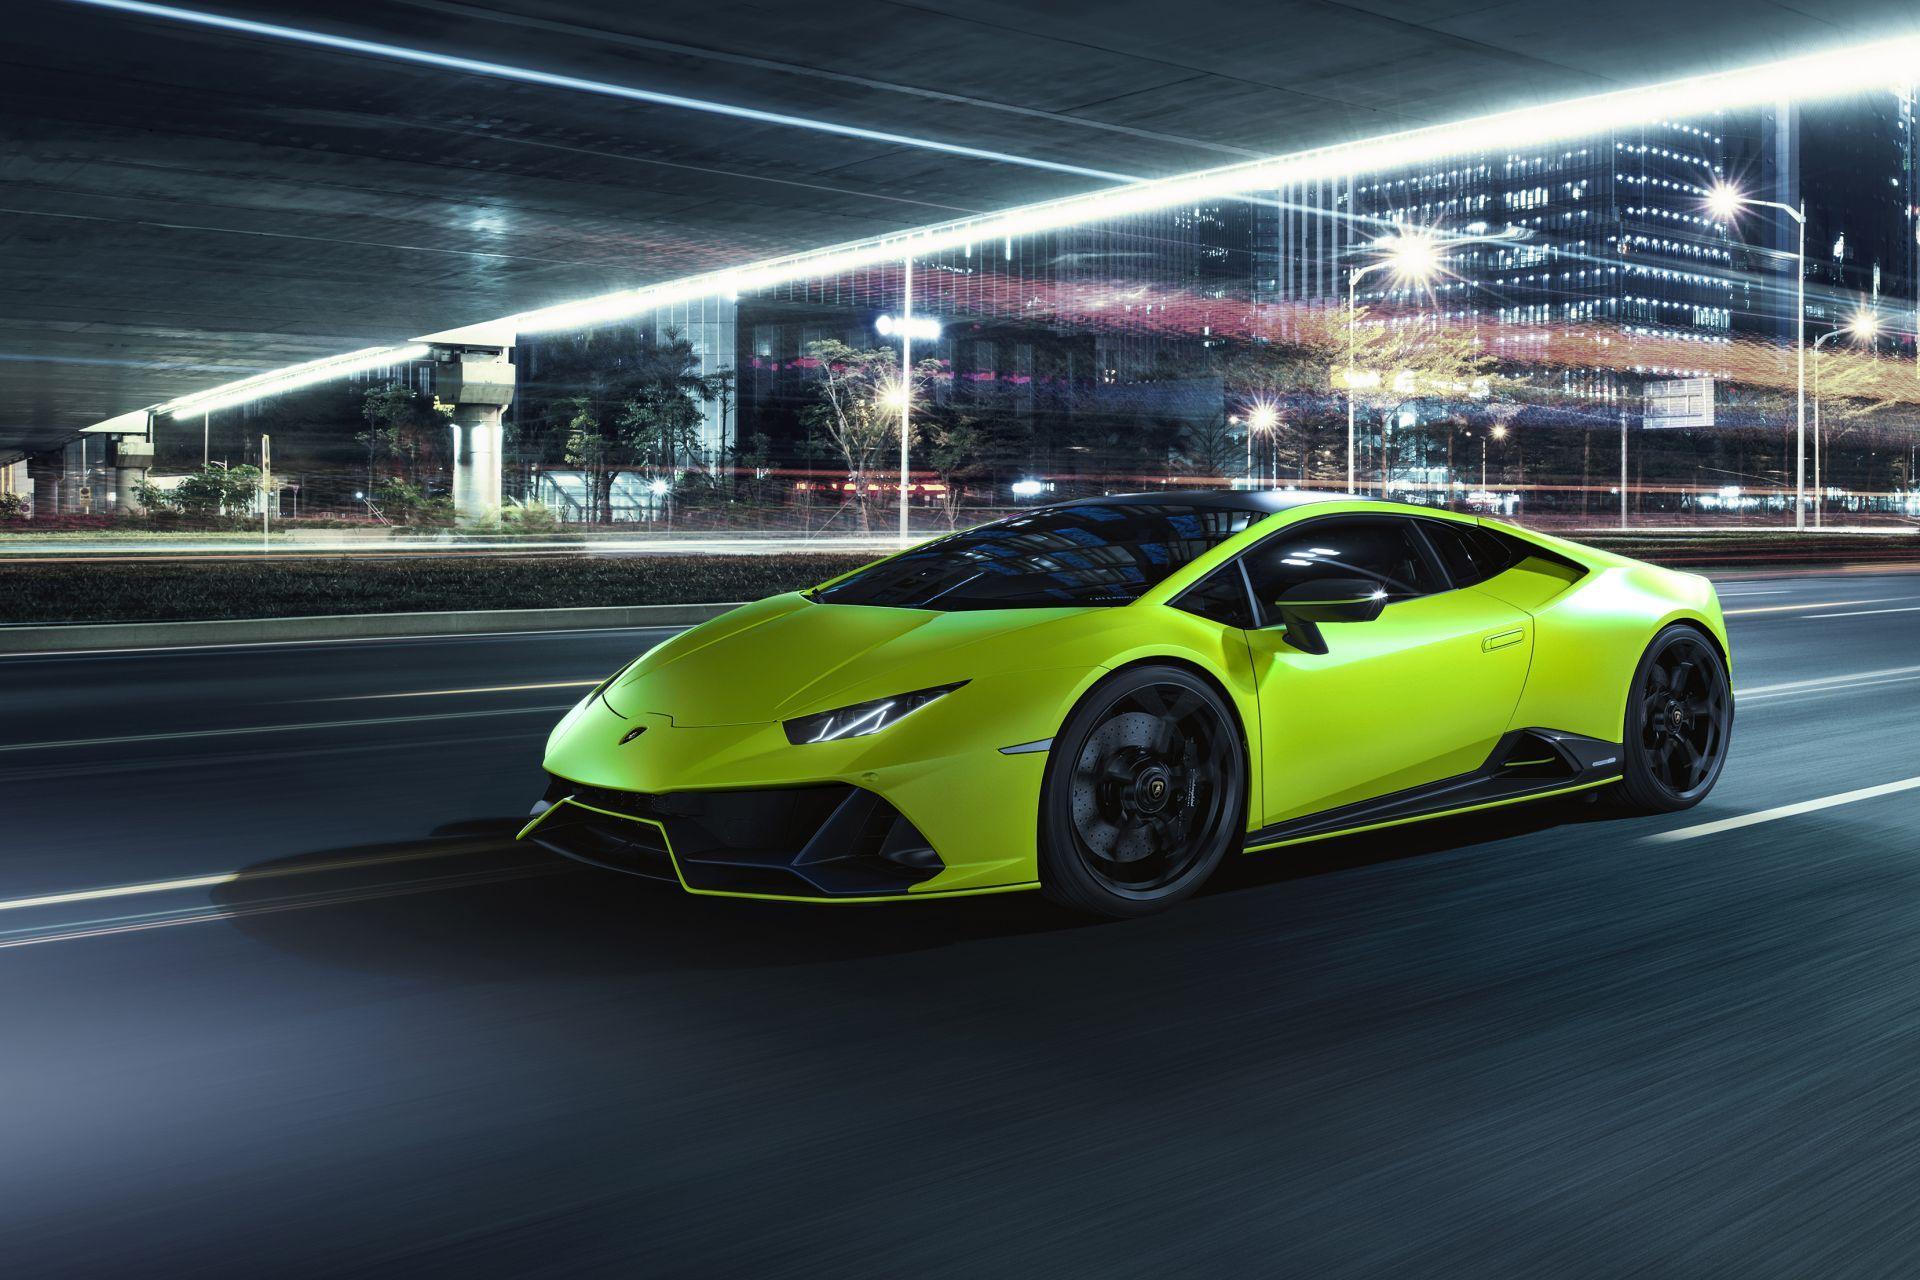 Lamborghini-Huracan-Evo-Fluo-Capsule-17